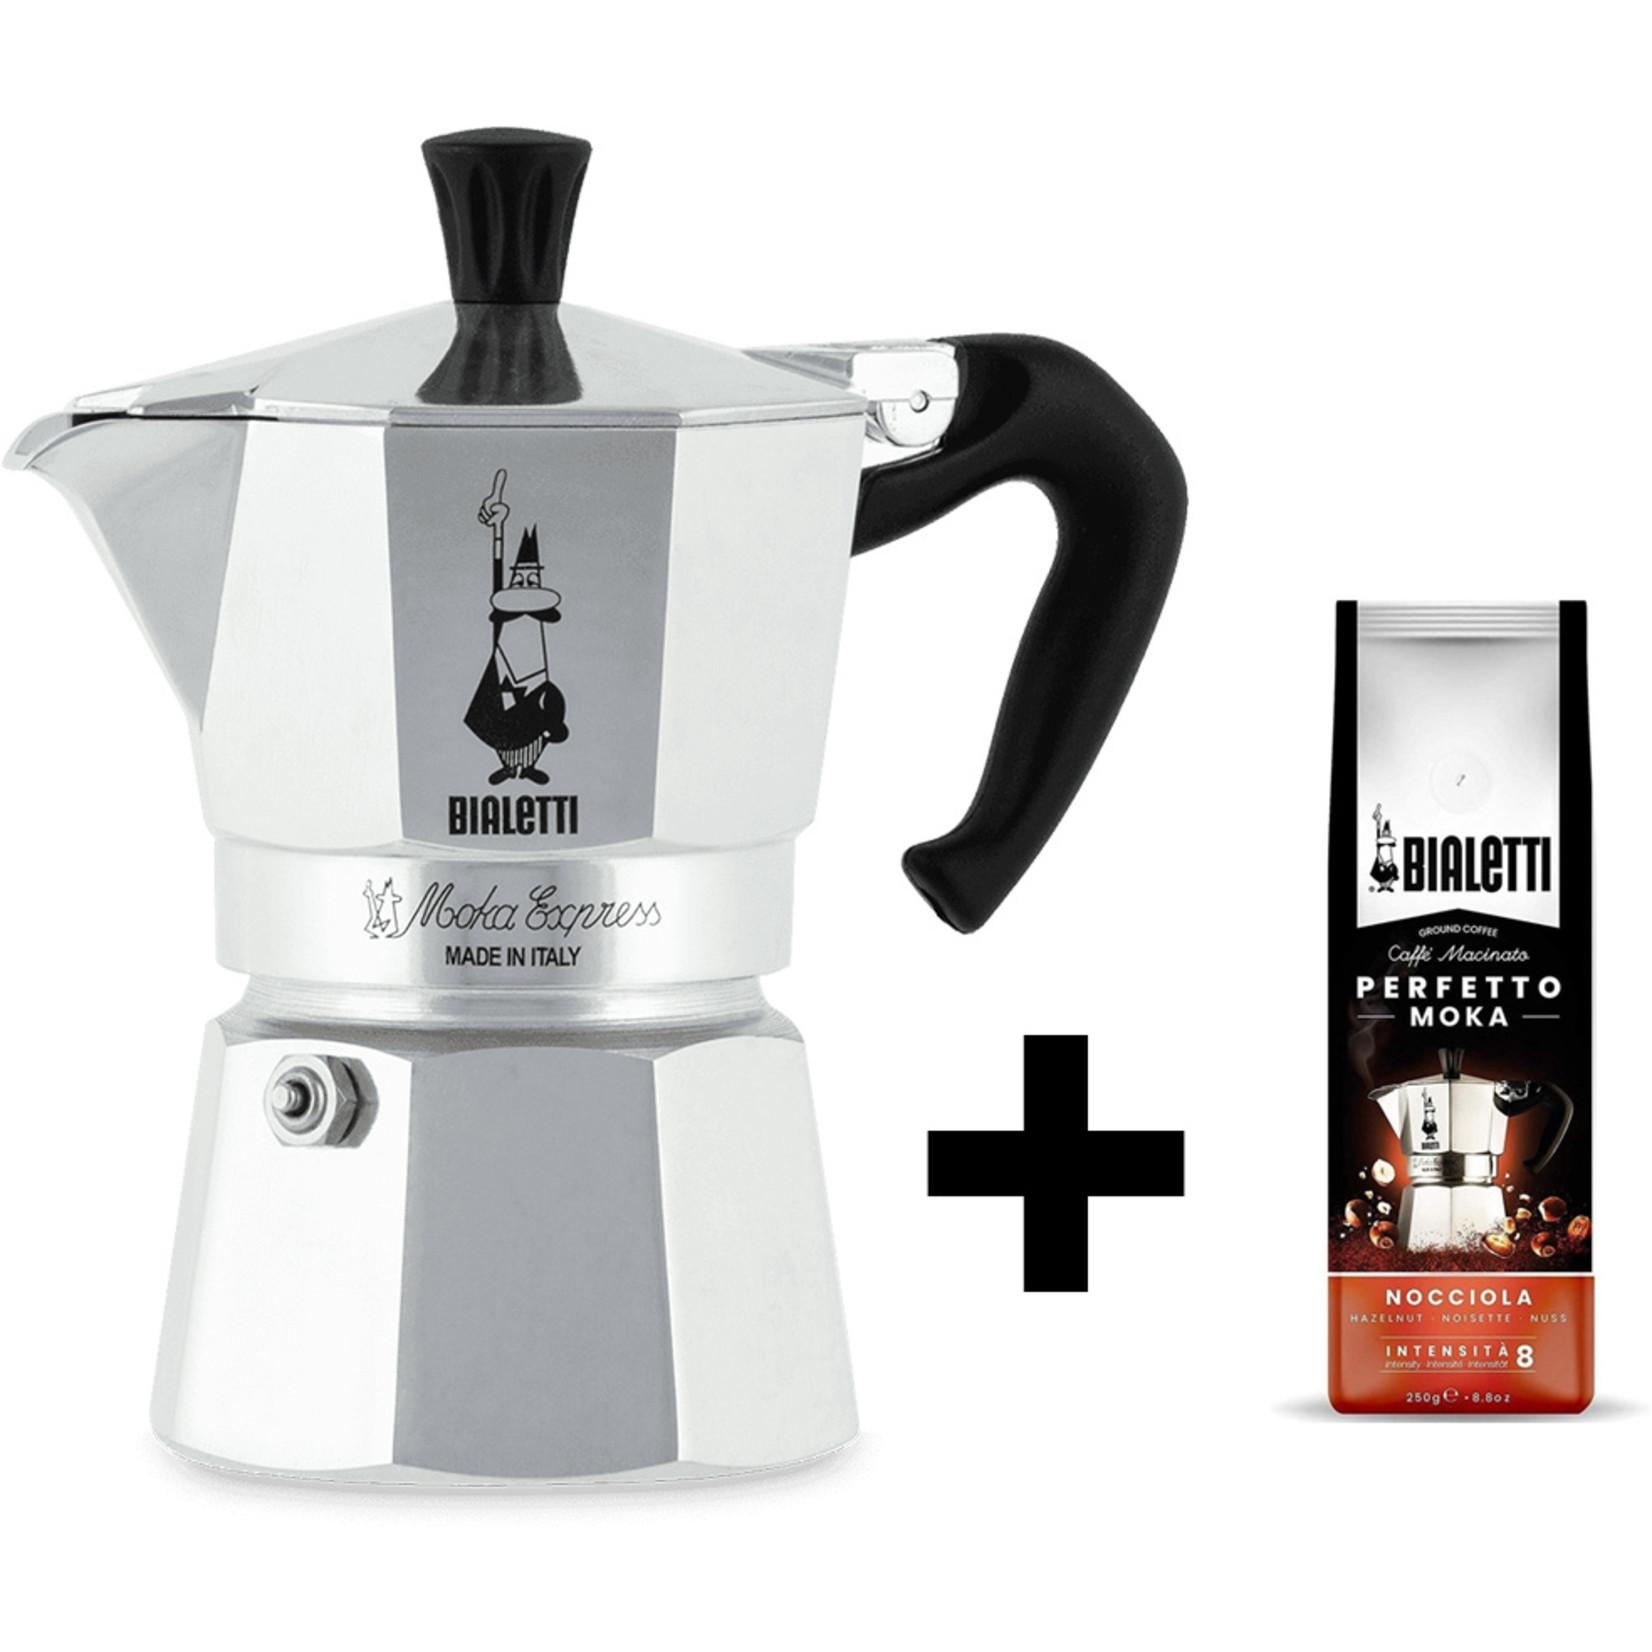 Bialetti Bialetti Moka Express 3 kops percolator, met gratis koffie